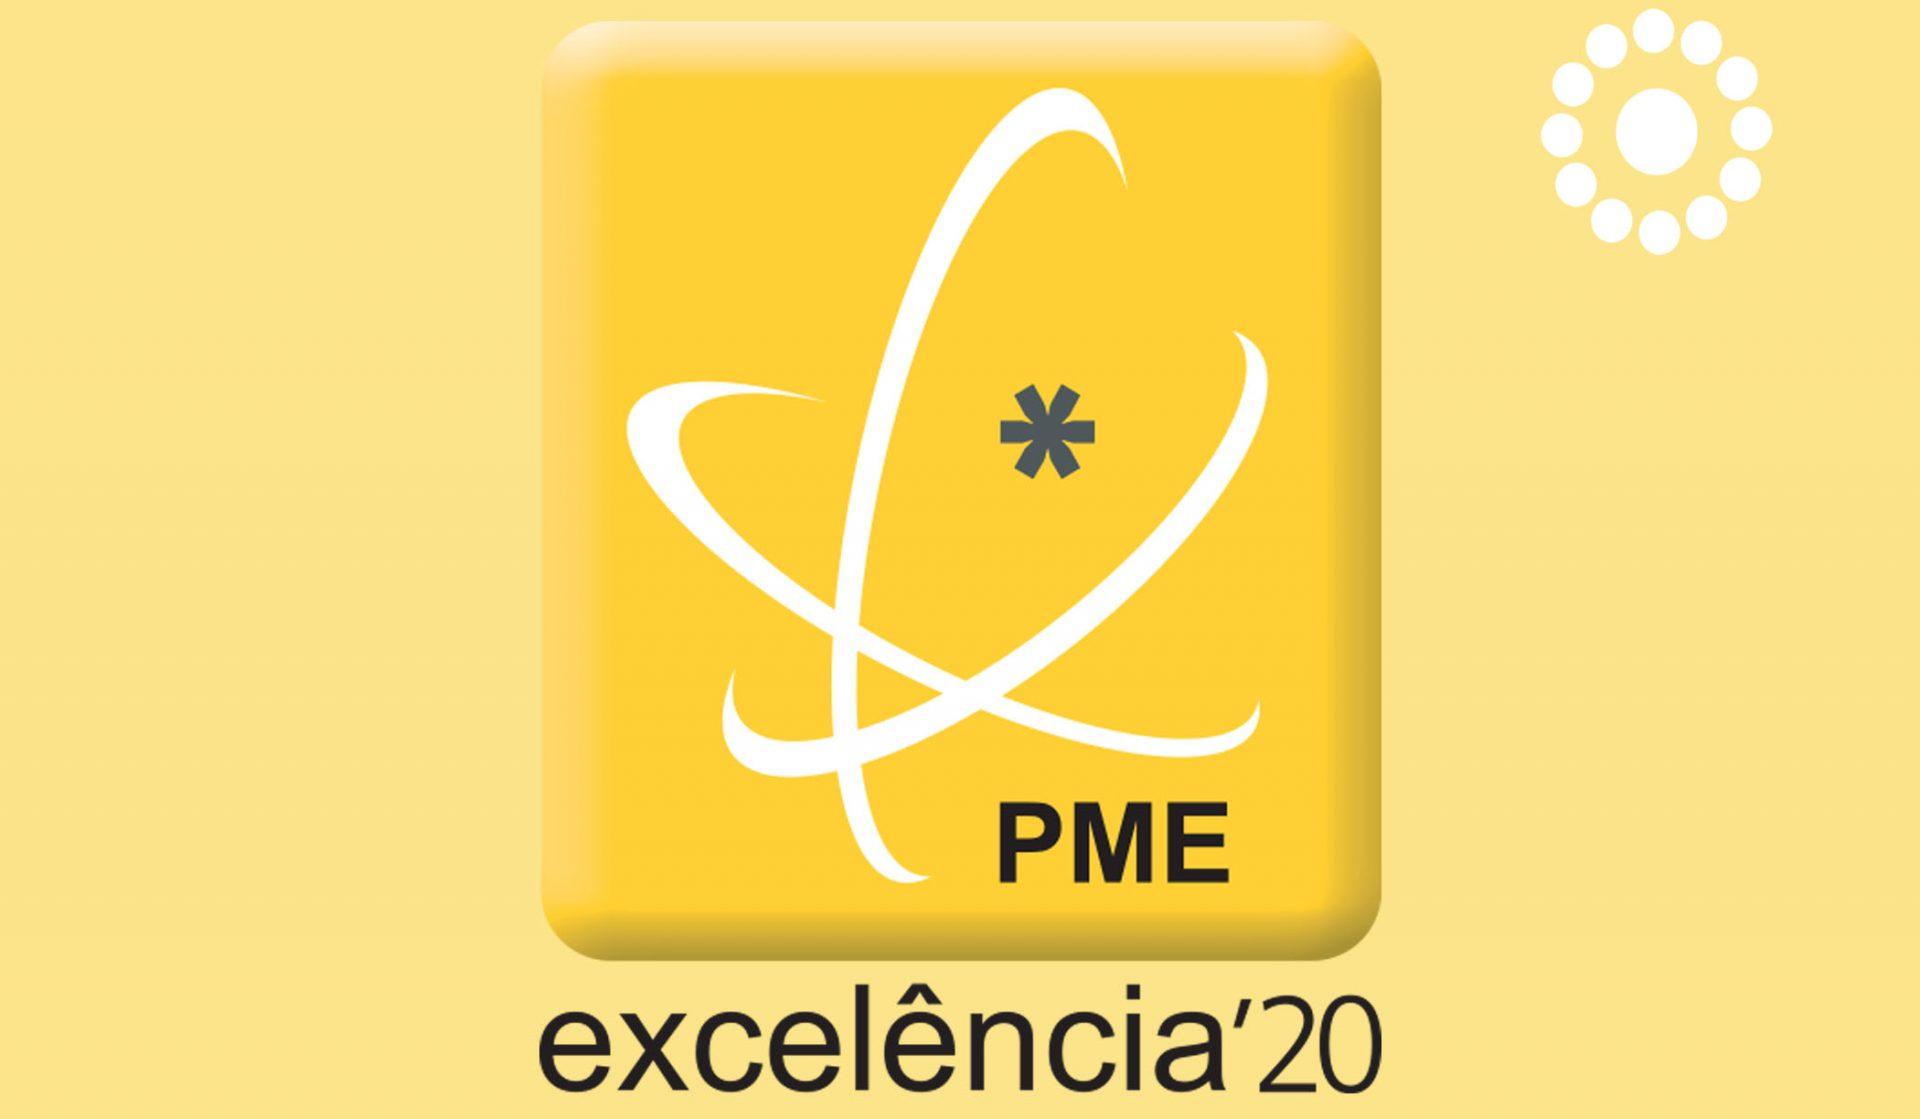 Excellence SME 2020